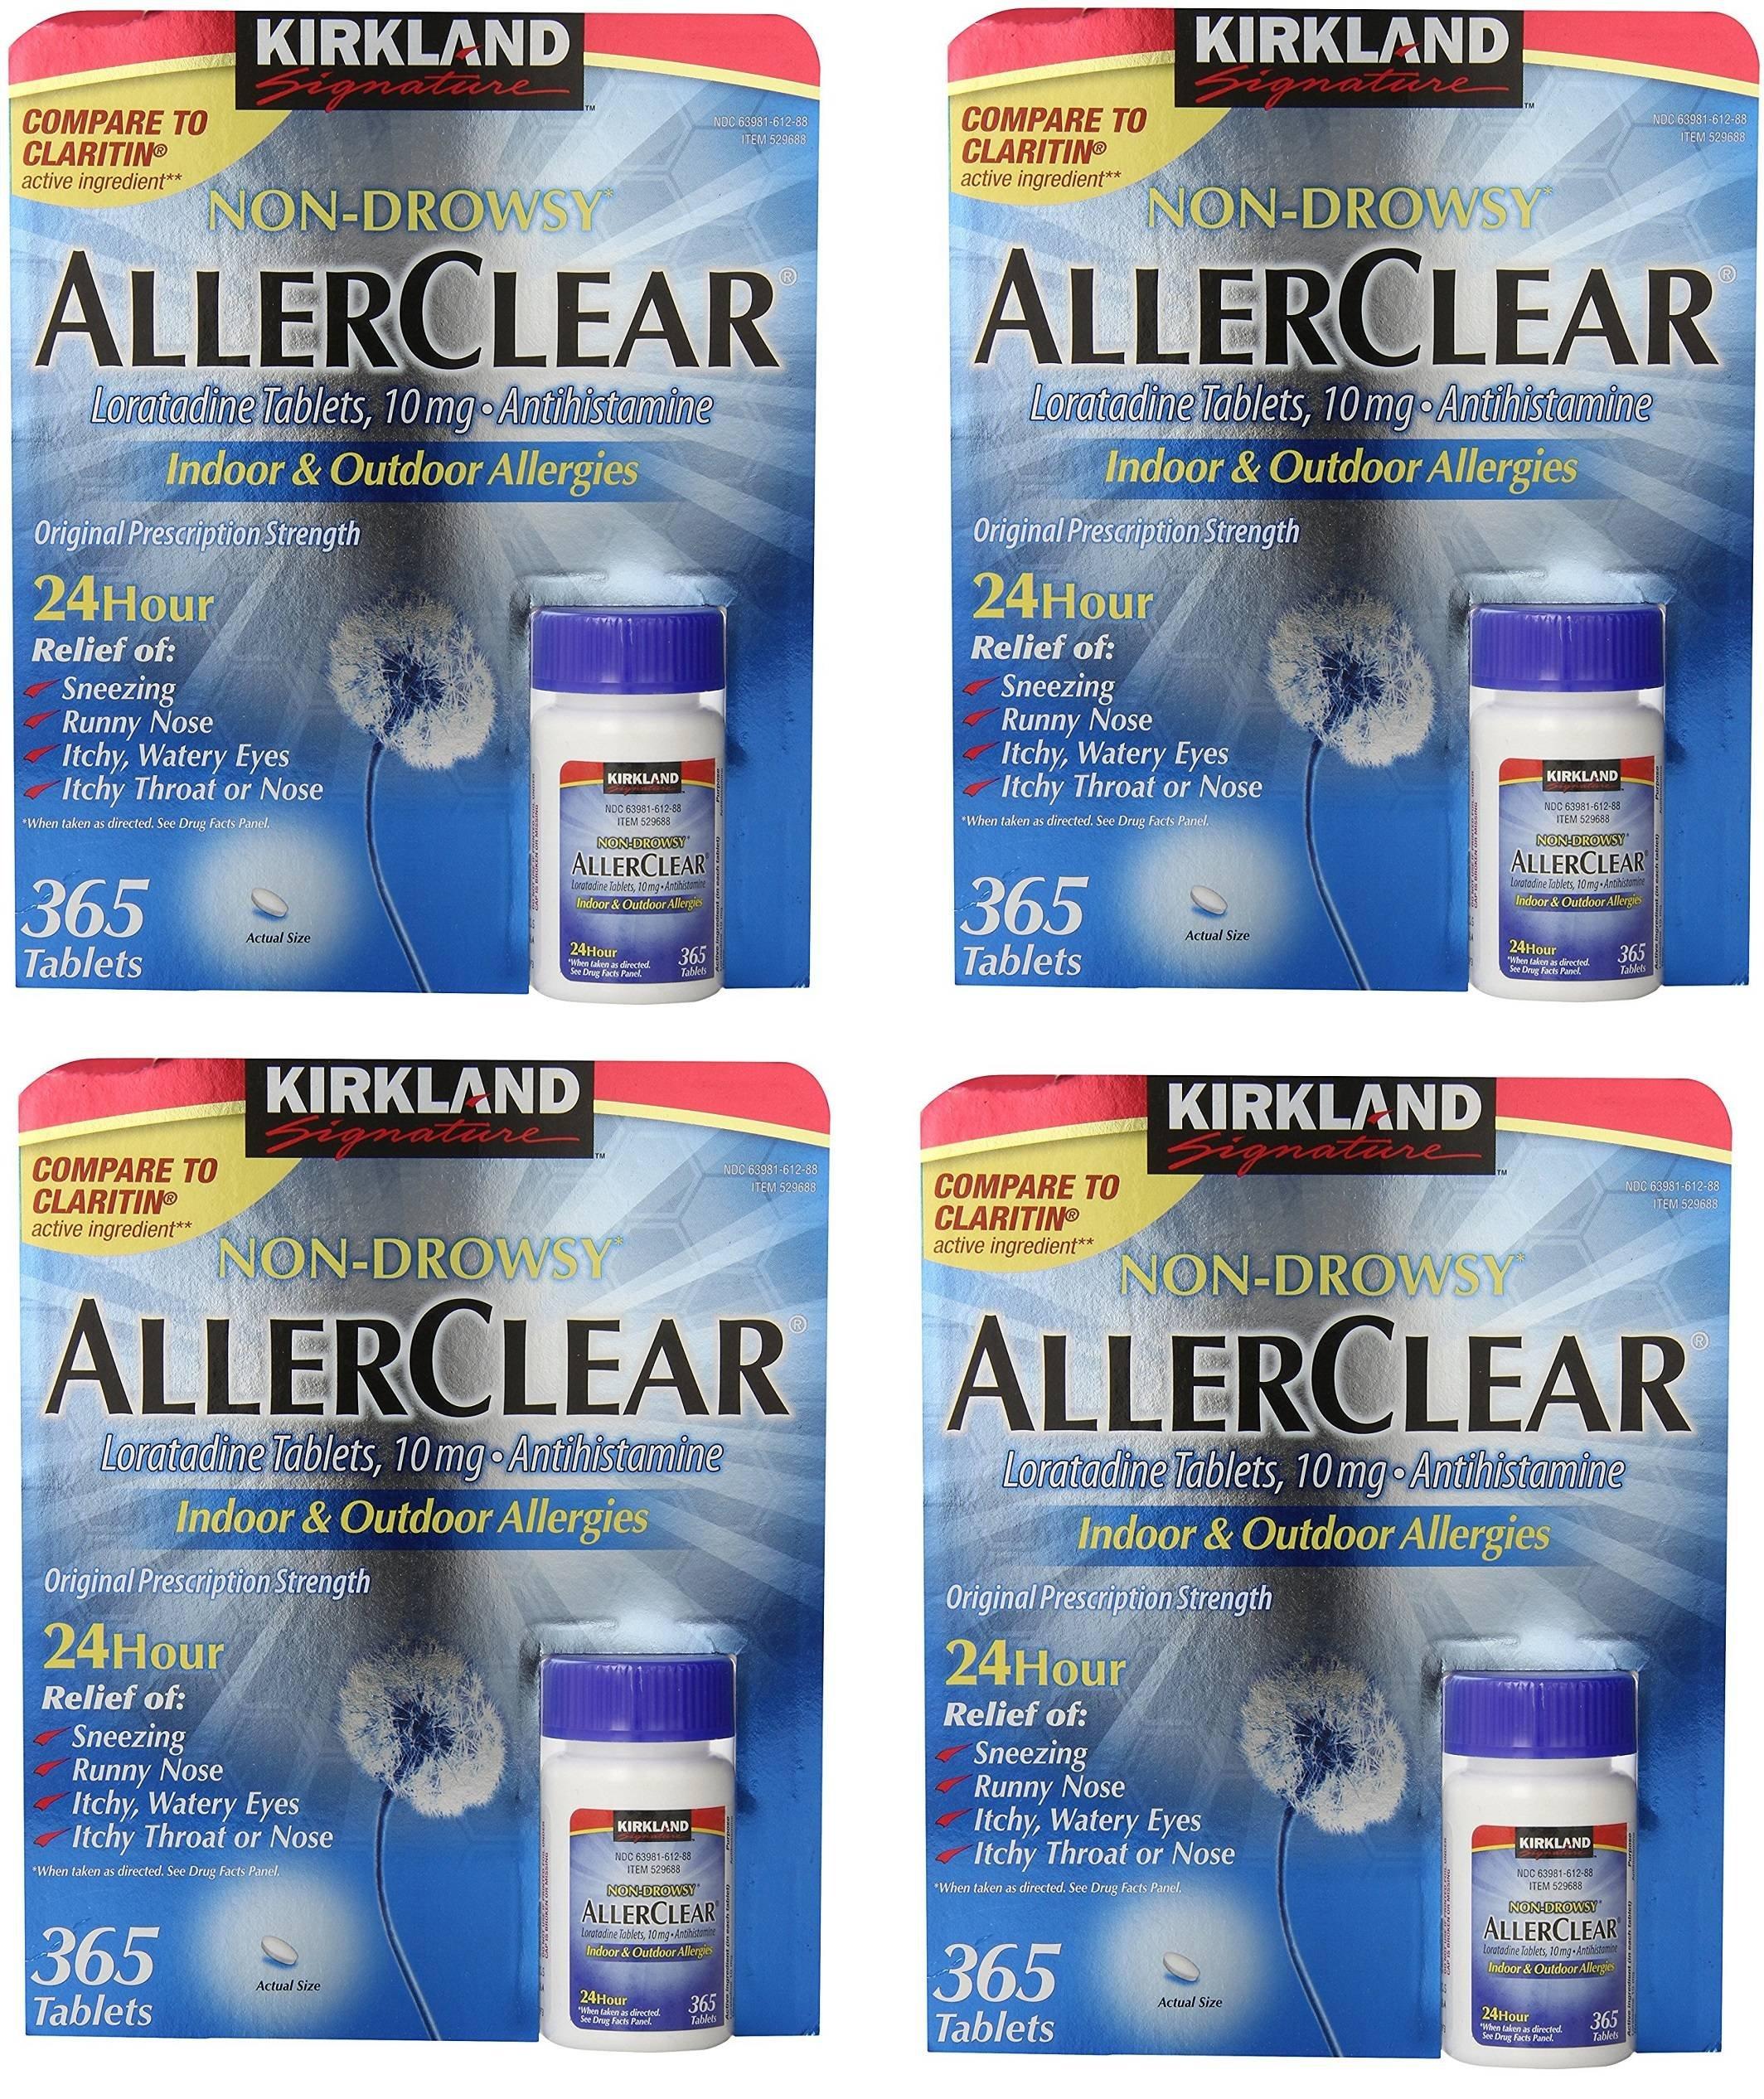 Kirkland Signature Non Drowsy Allerclear Loratadine Tablets, Antihistamine, 10mg, 4 Units (365 Count) by Kirkland Signature